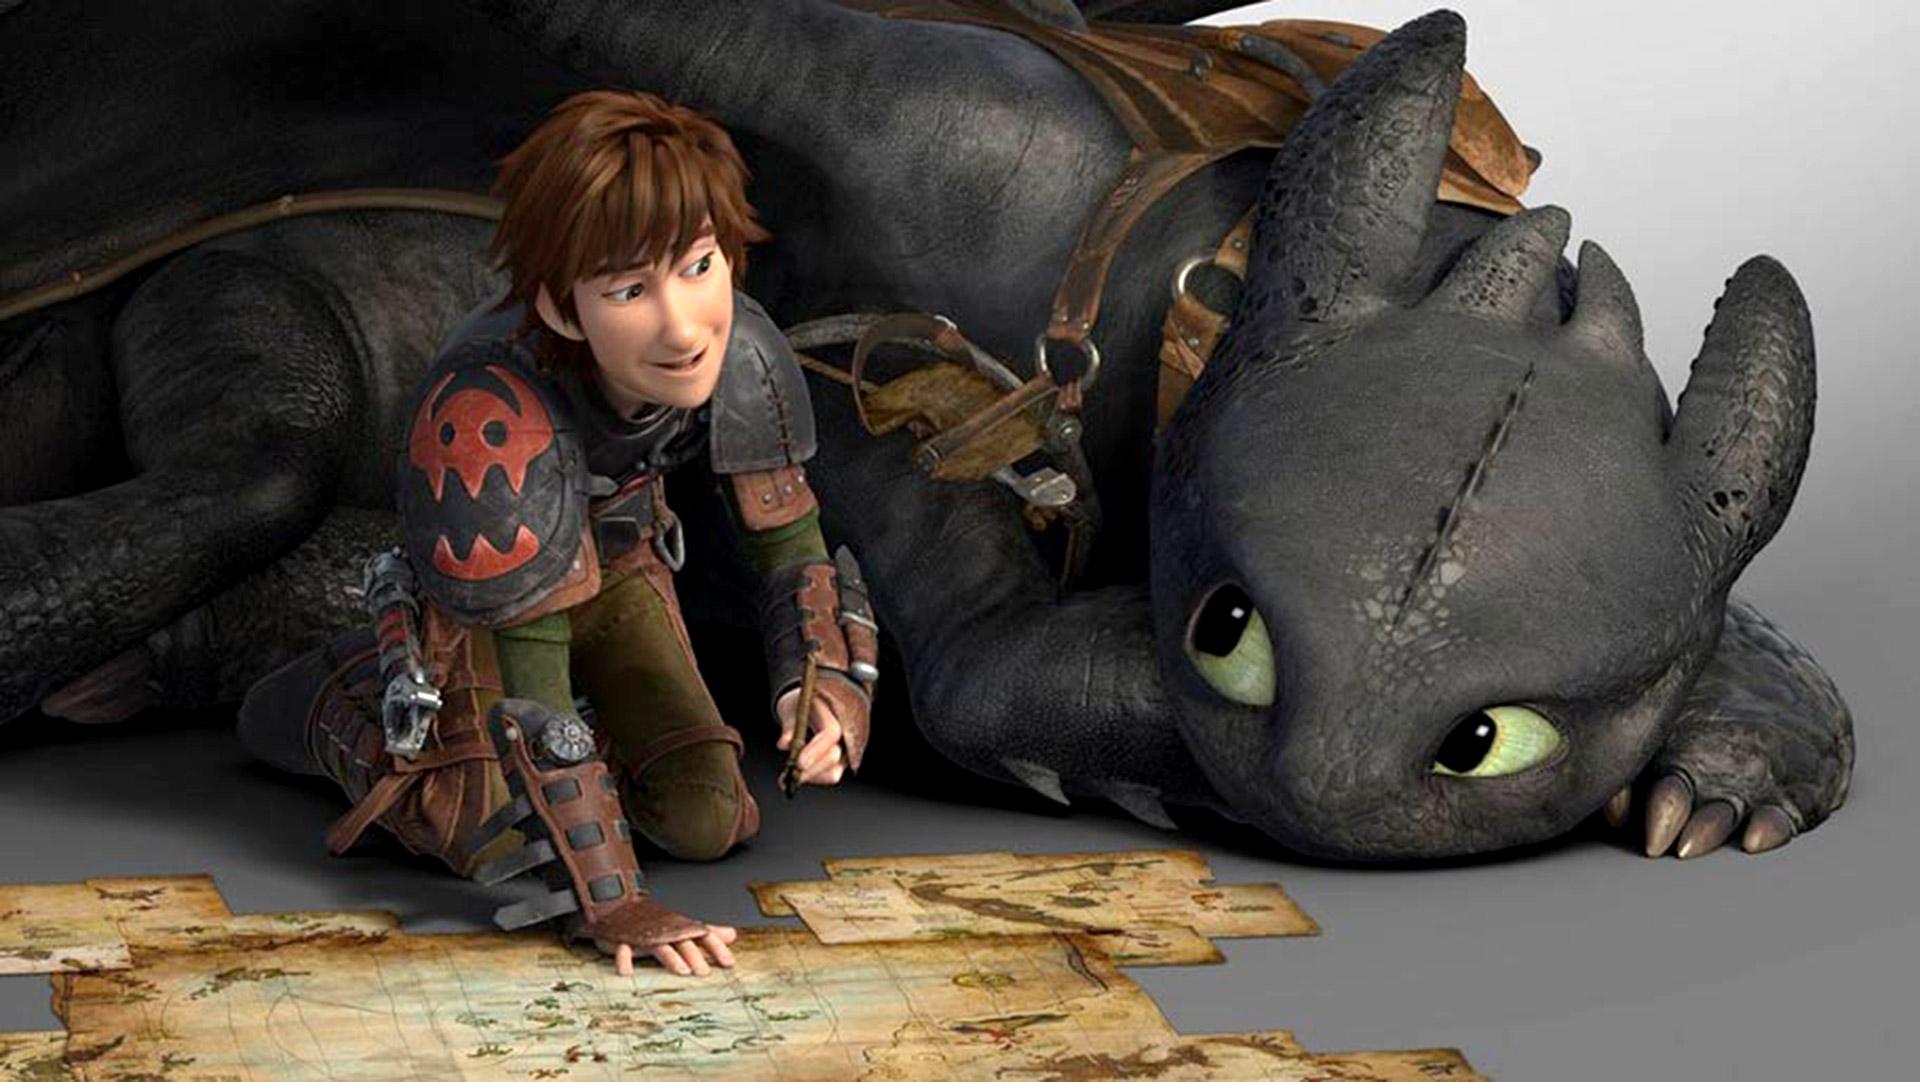 30 Dmc: Day 19 €� Your Favourite Animated Movie